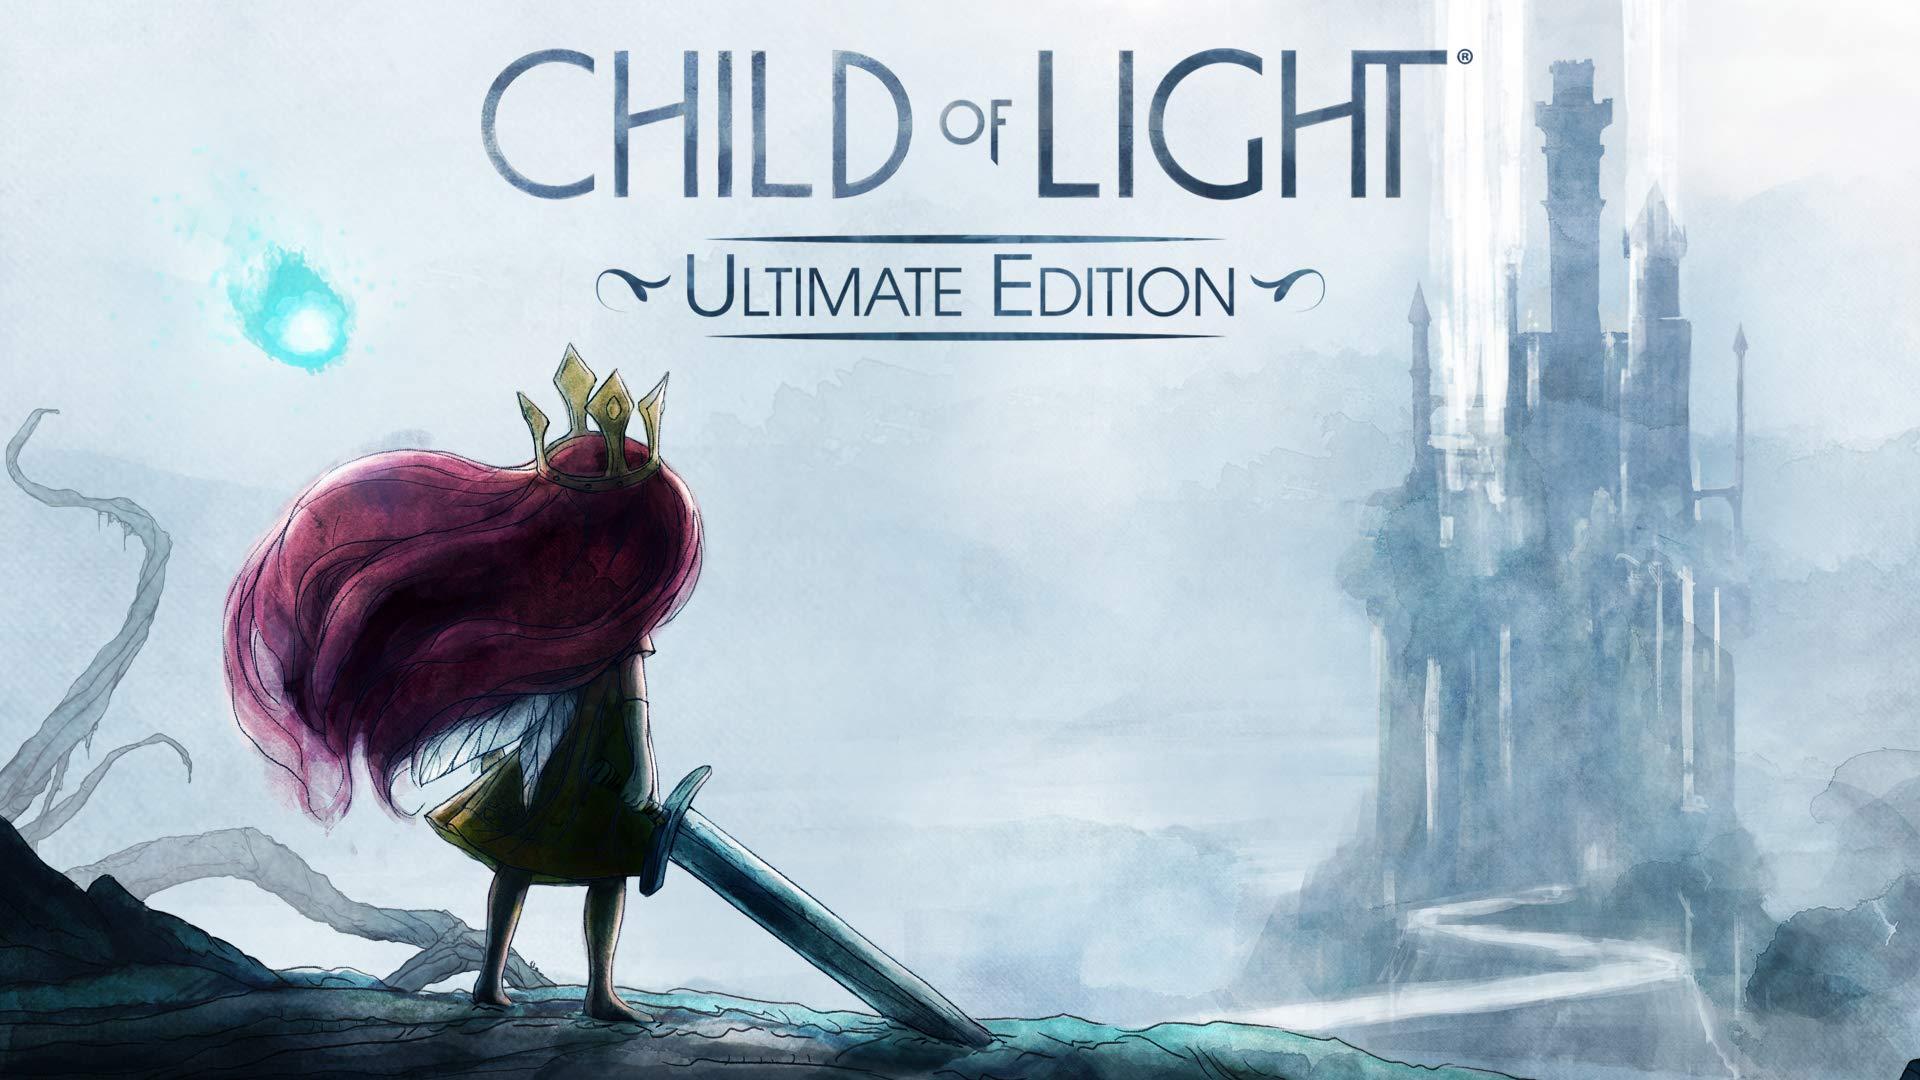 Child of Light Ultimate Edition - Nintendo Switch [Digital Code]